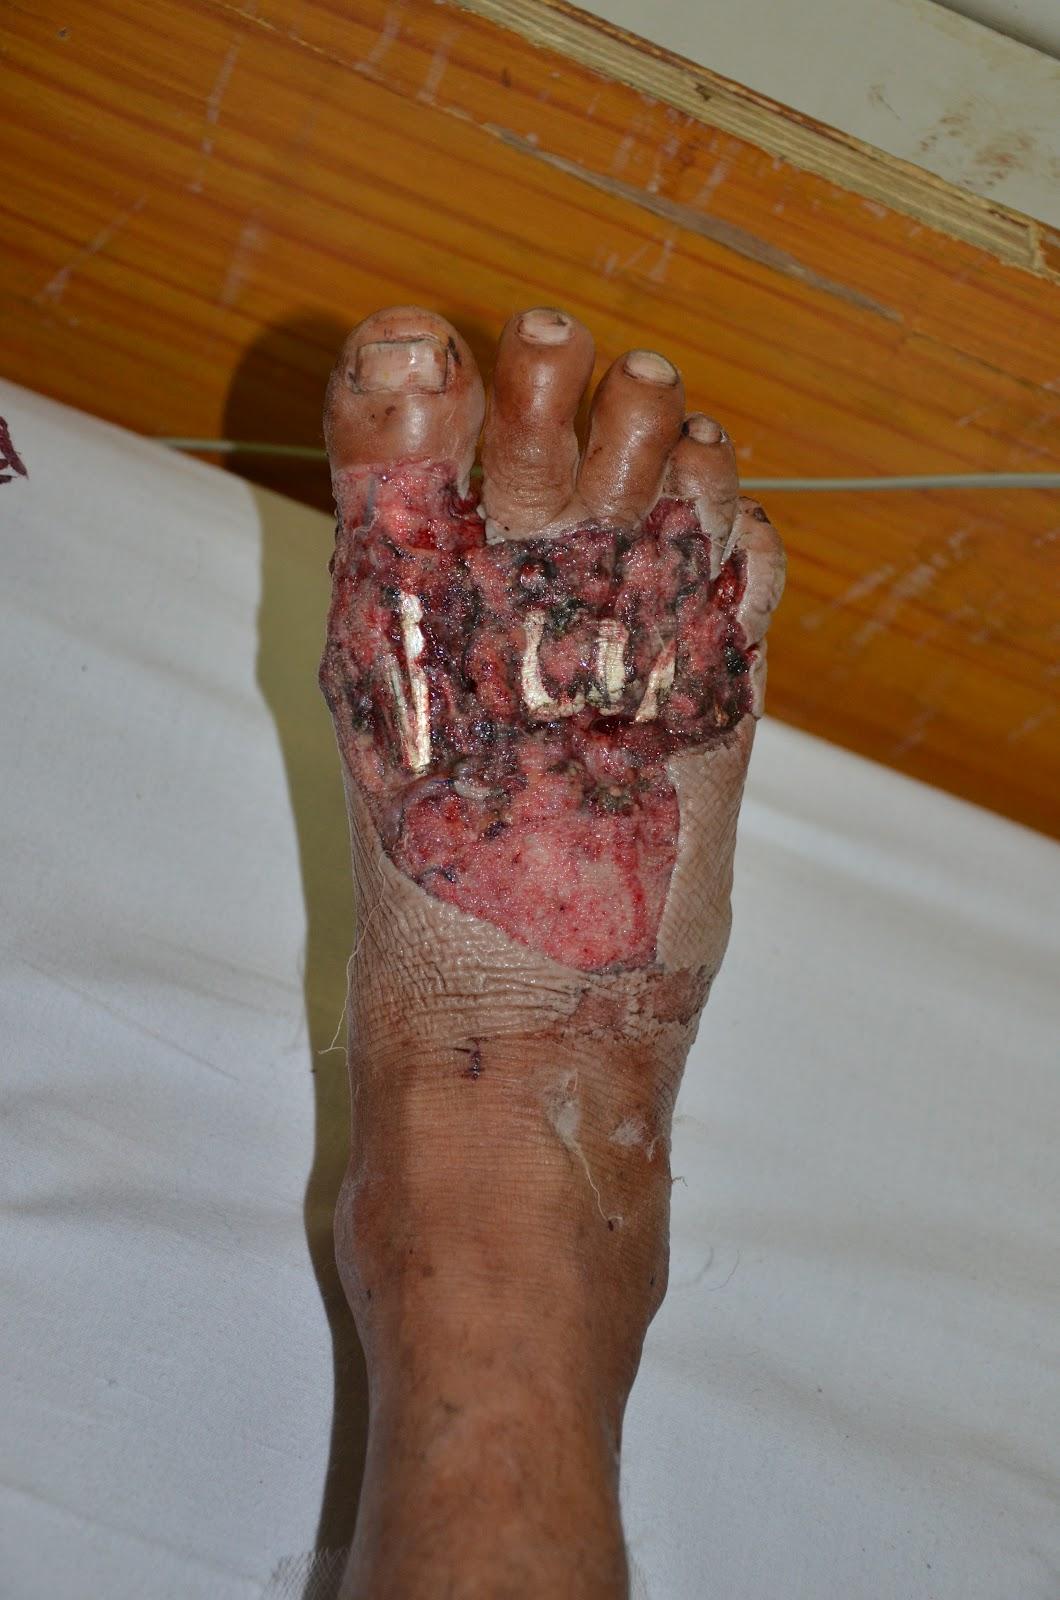 CRUSH INJURY FOOT - RUN OVER - FREE LD FLAP COVERAGE ...